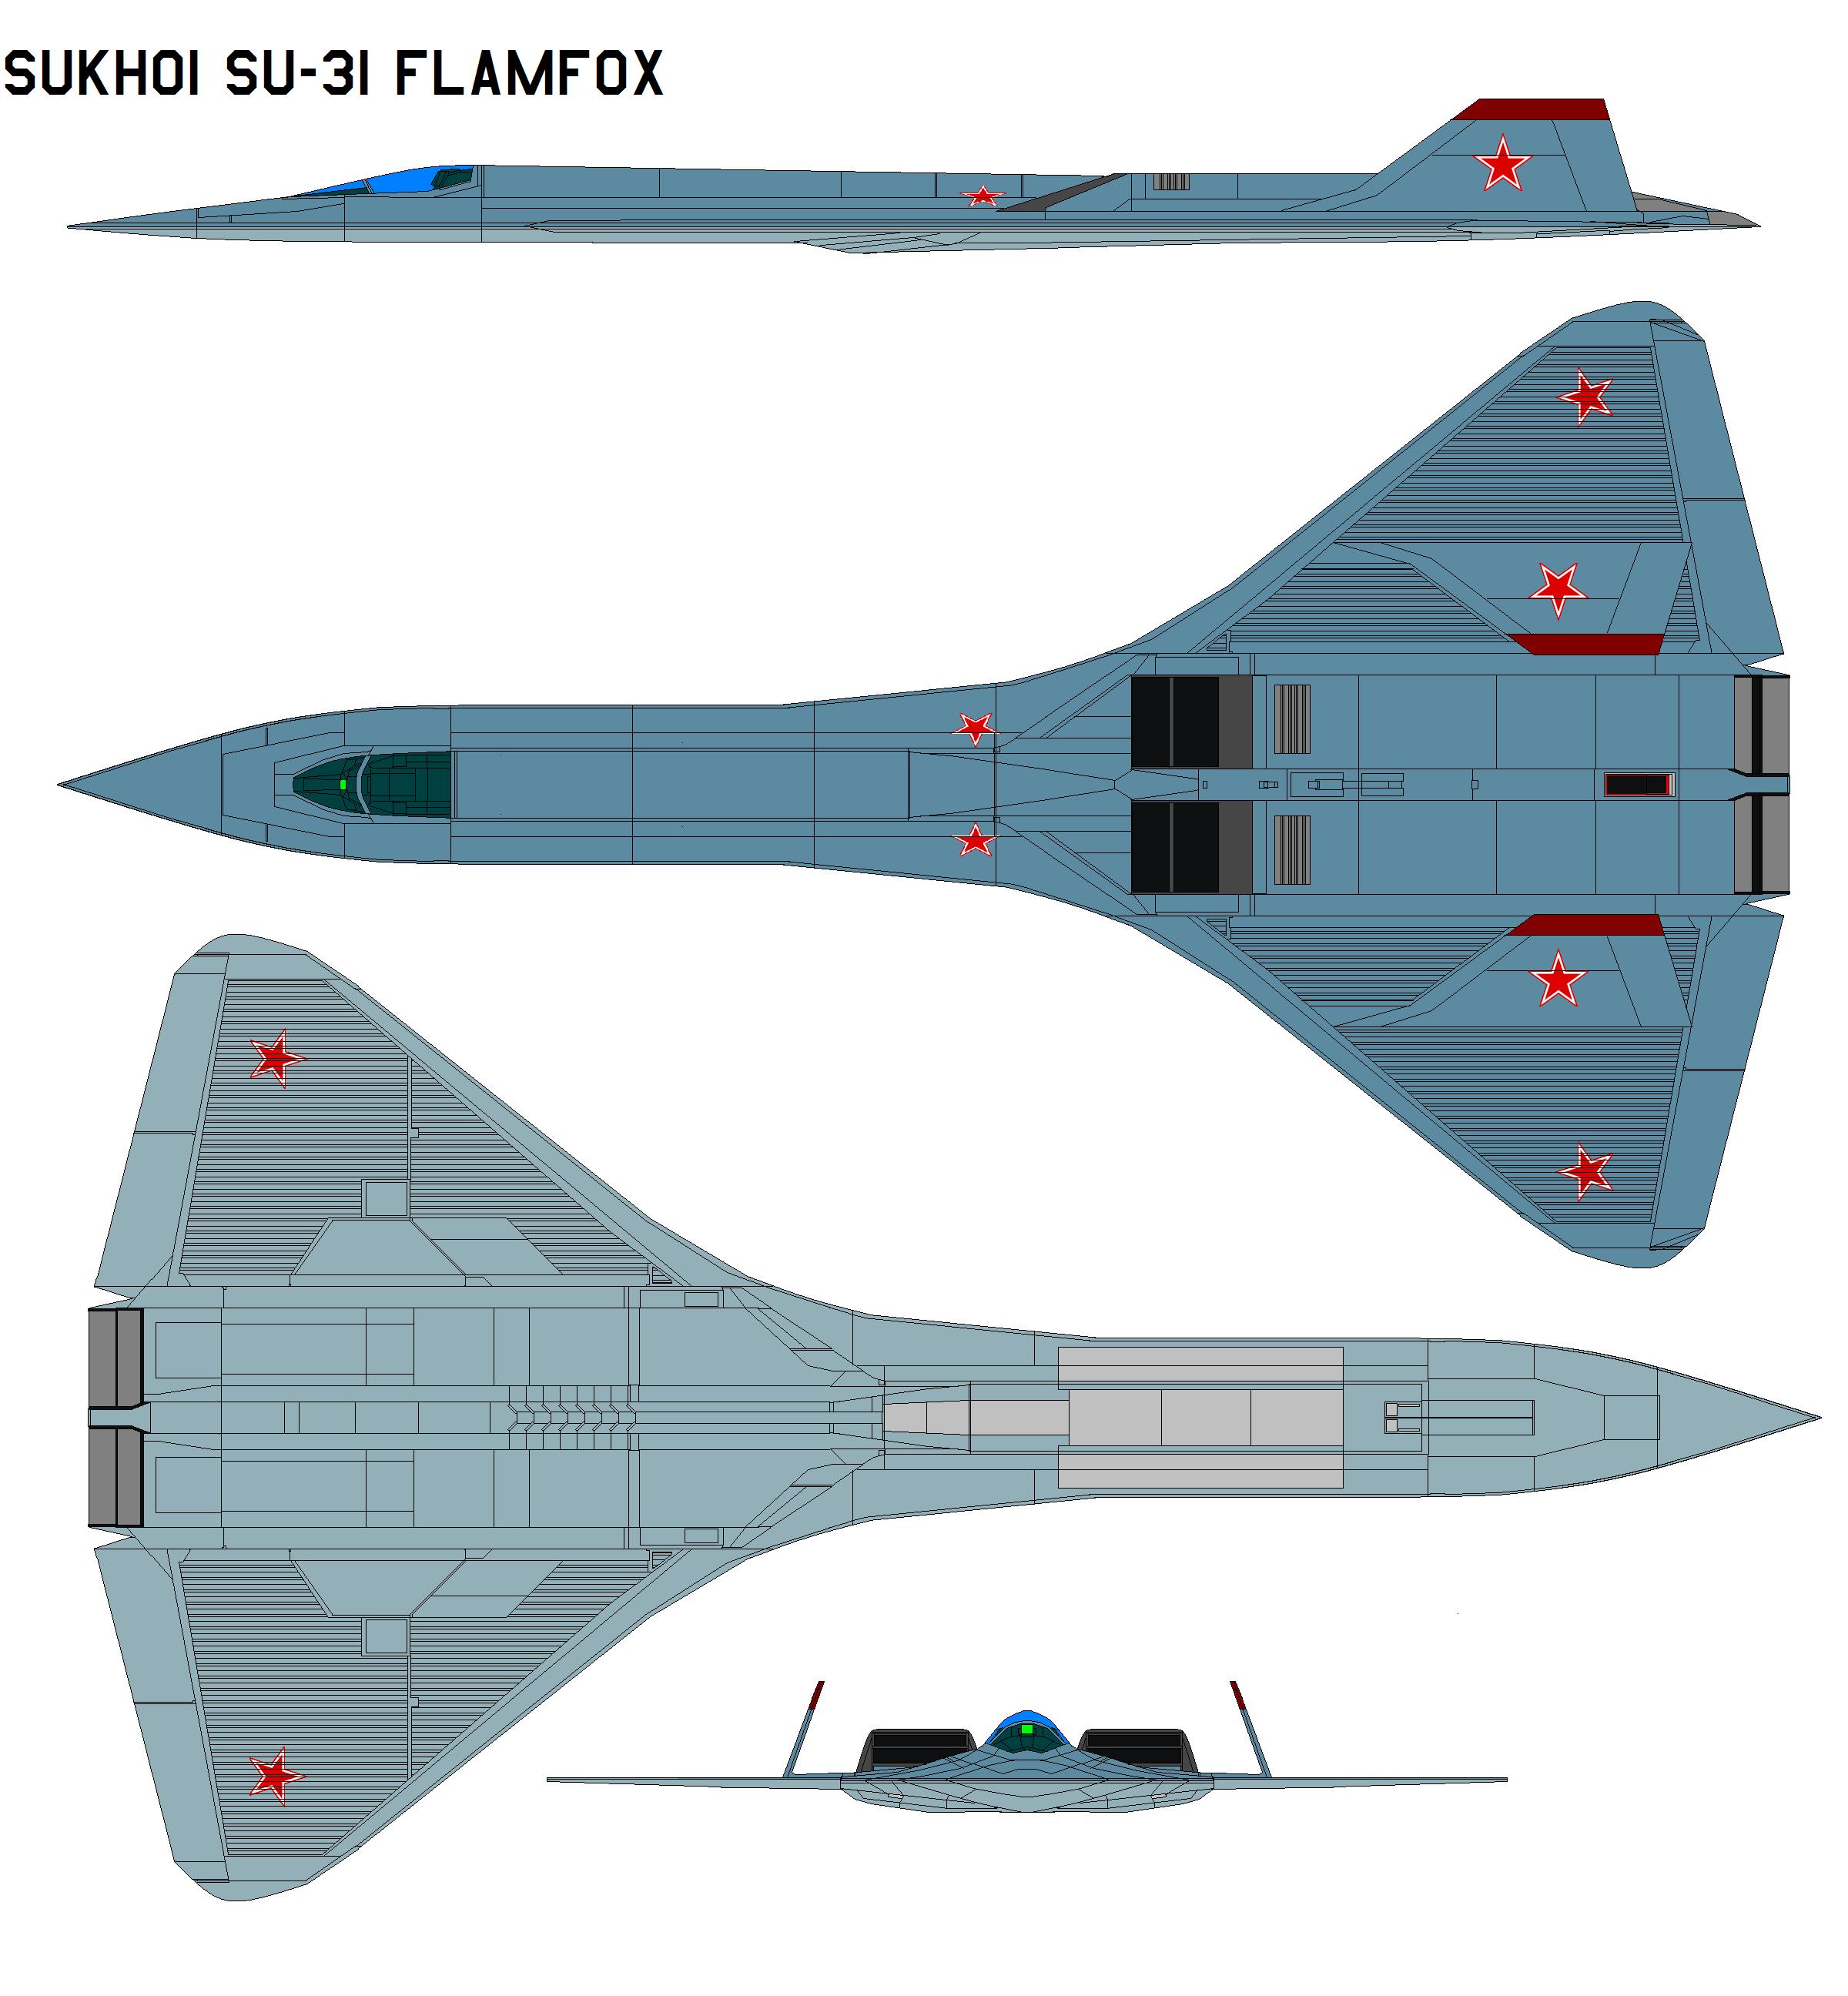 Sukhoi Su-31 Flamfox By Bagera3005 On DeviantArt